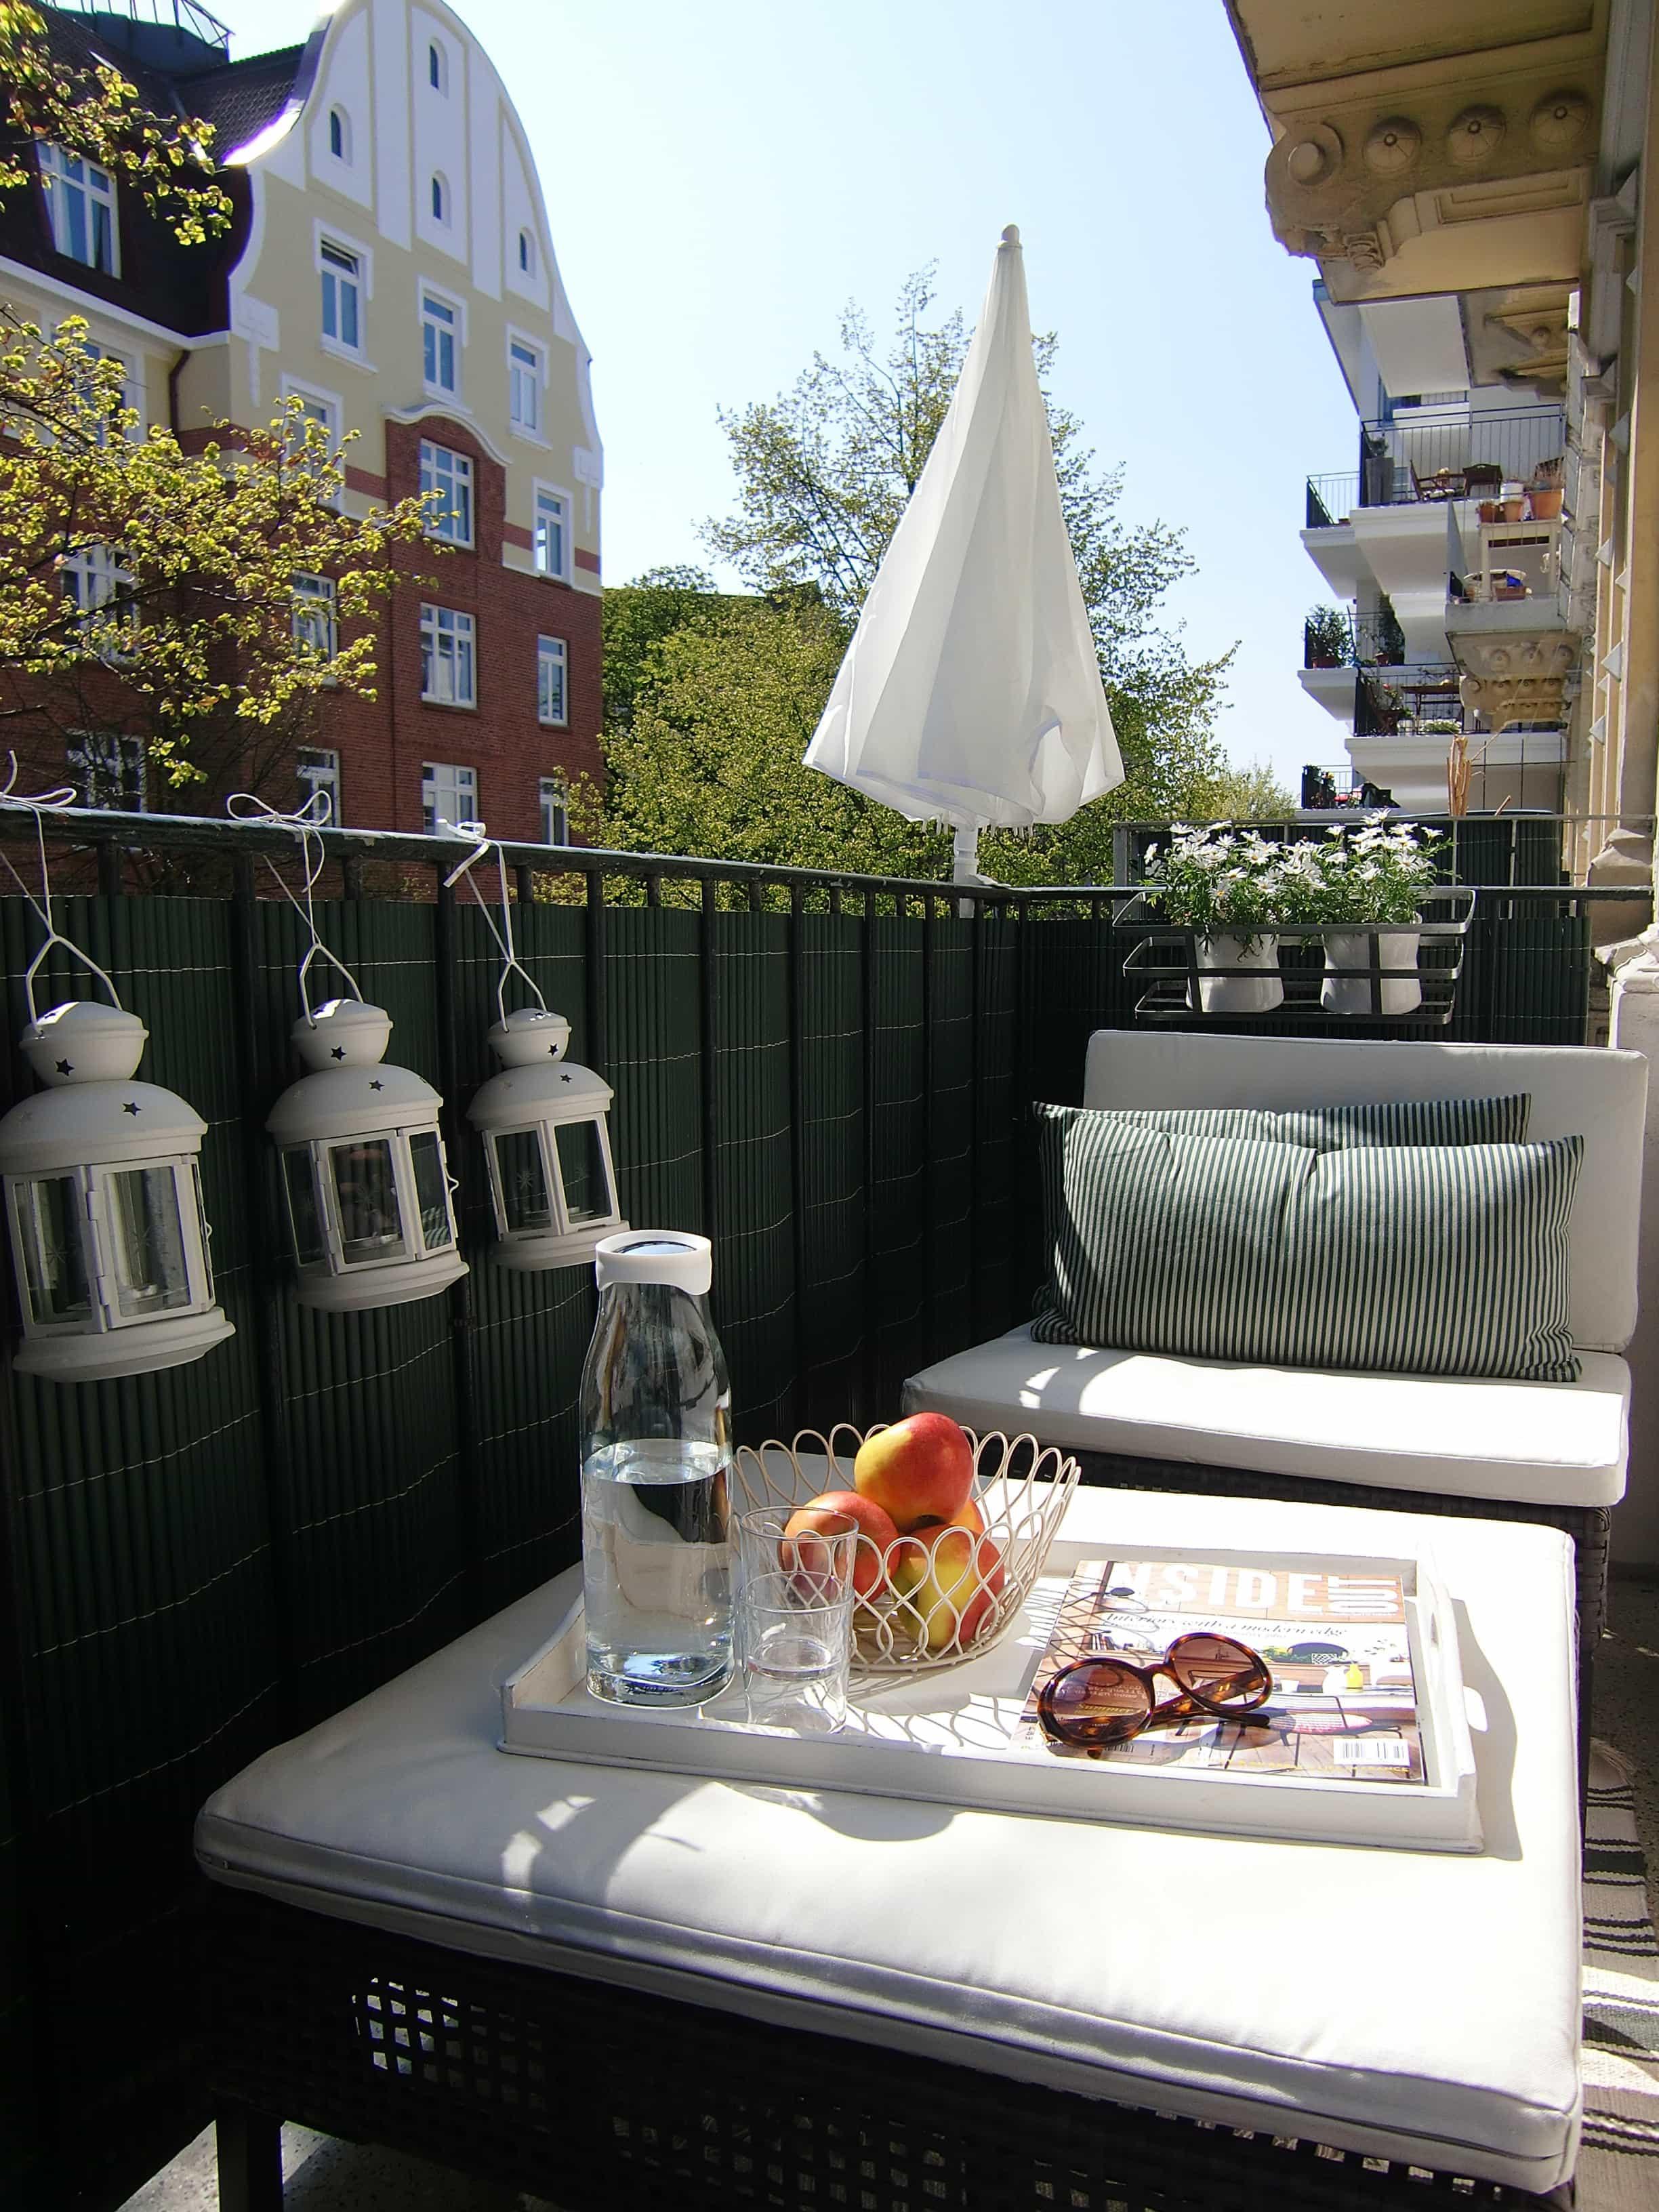 frierst du noch oder bereitest du dich schon auf den sommer vor hier gibt s tolle balkonm bel. Black Bedroom Furniture Sets. Home Design Ideas